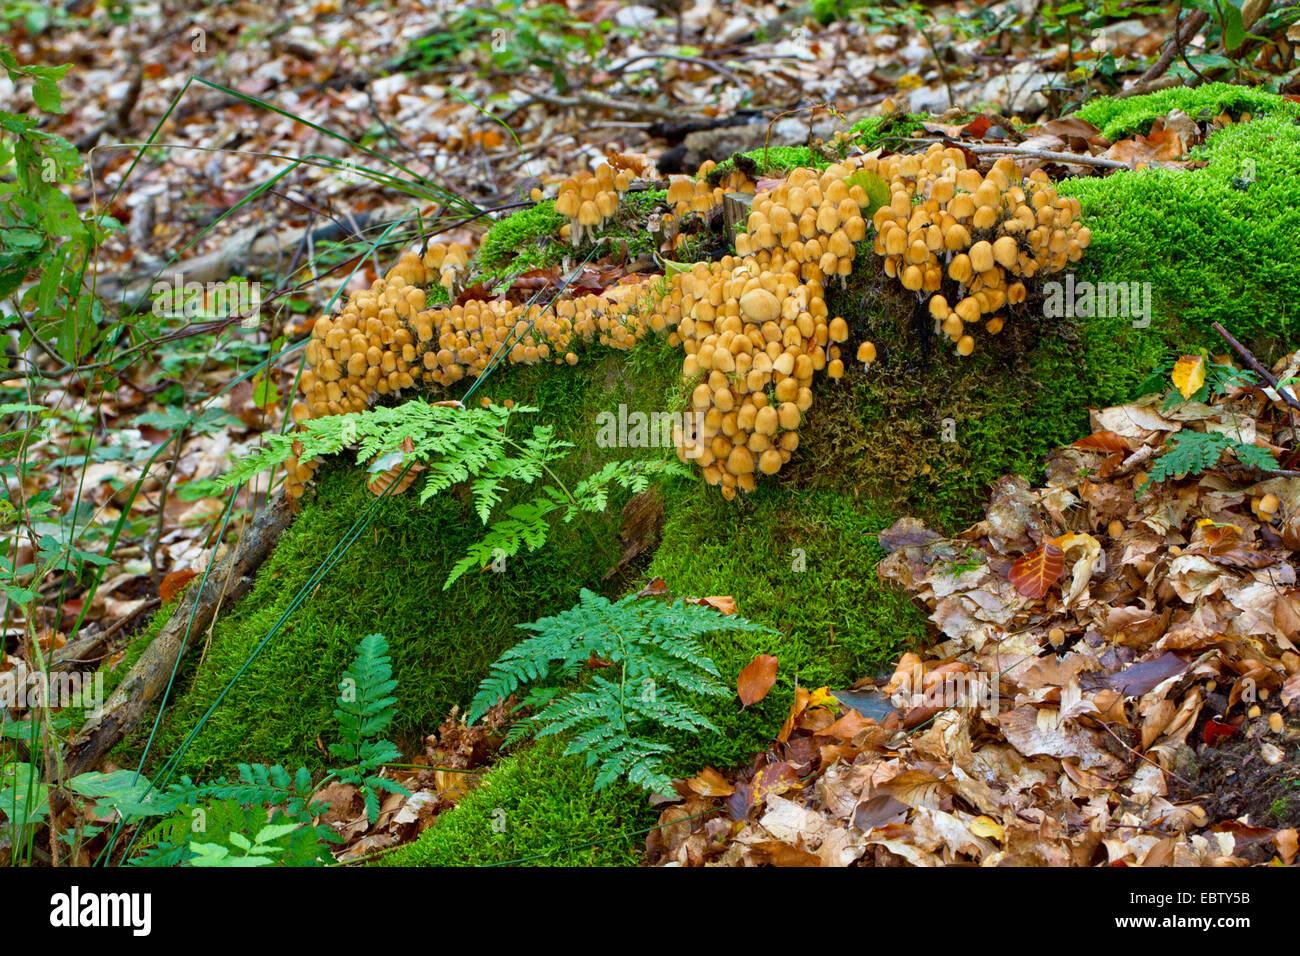 glistening inkcap (Coprinus micaceus), on mossy tree snag, Germany, Mecklenburg-Western Pomerania - Stock Image